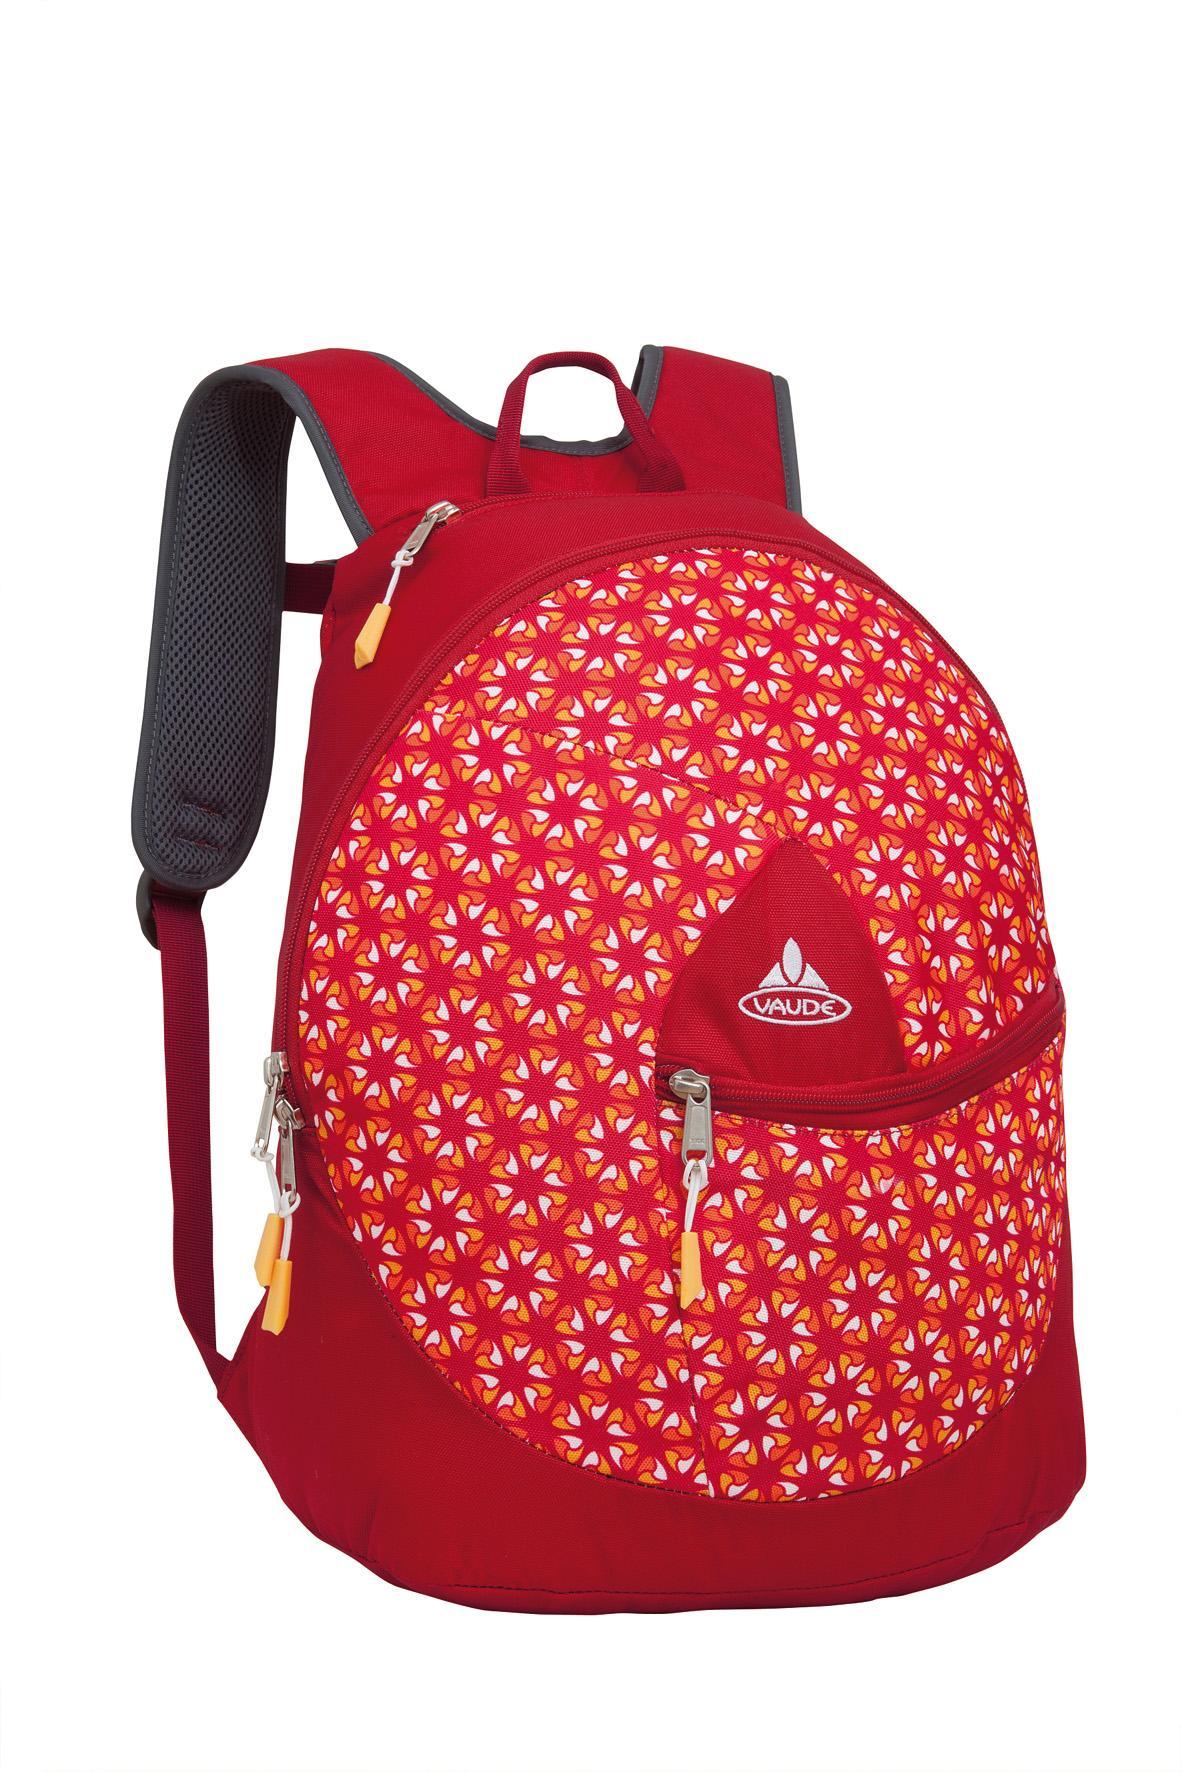 Dětský batoh Vaude Tick 12  6c95eebe40